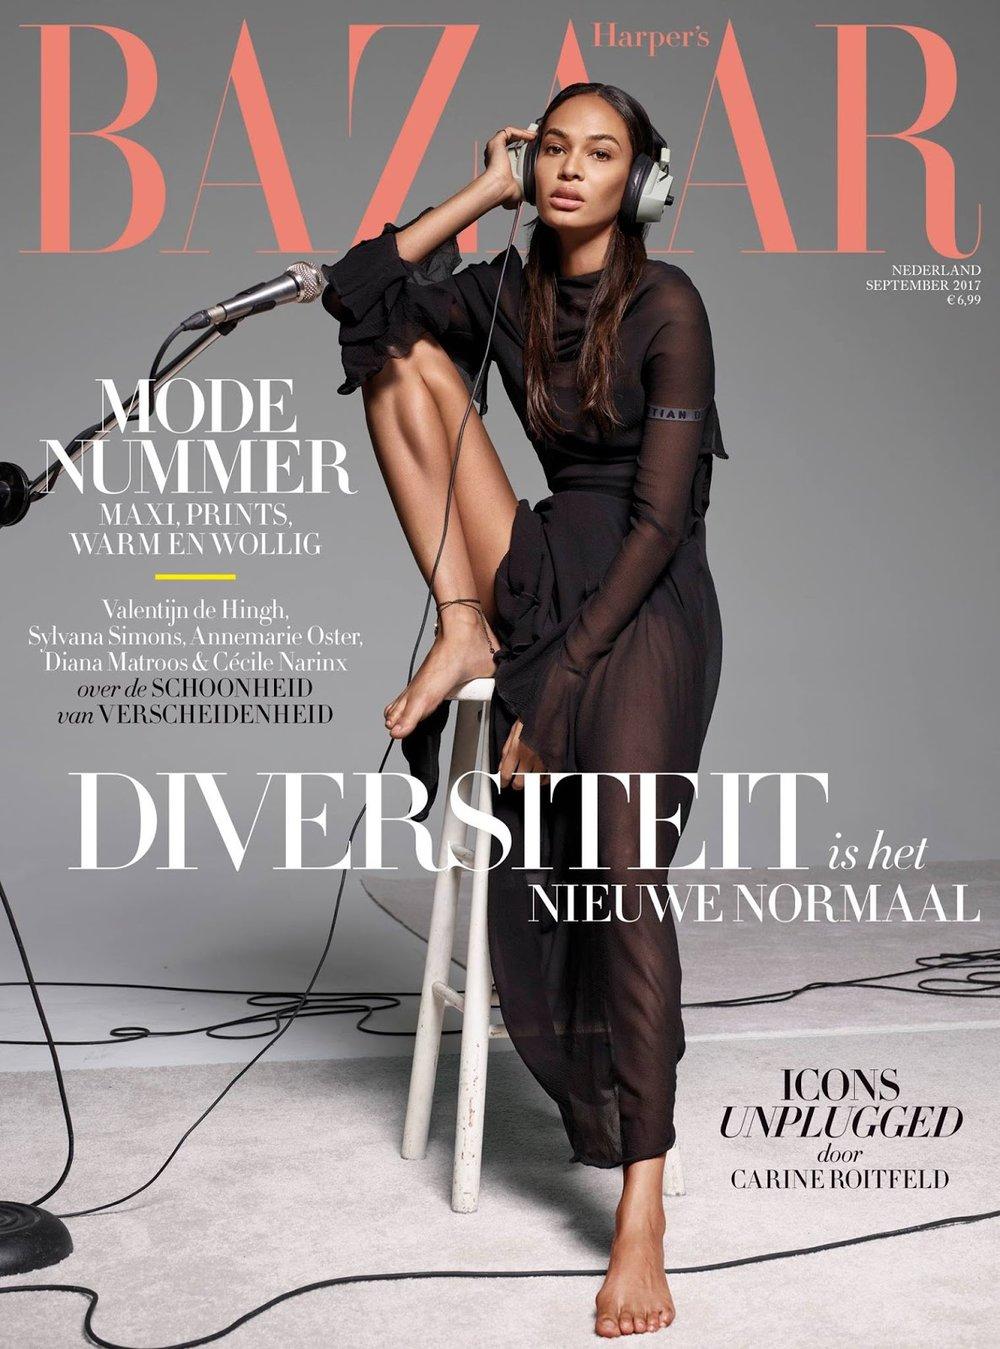 Harpers Bazaar September 2017 Netherlands.jpg